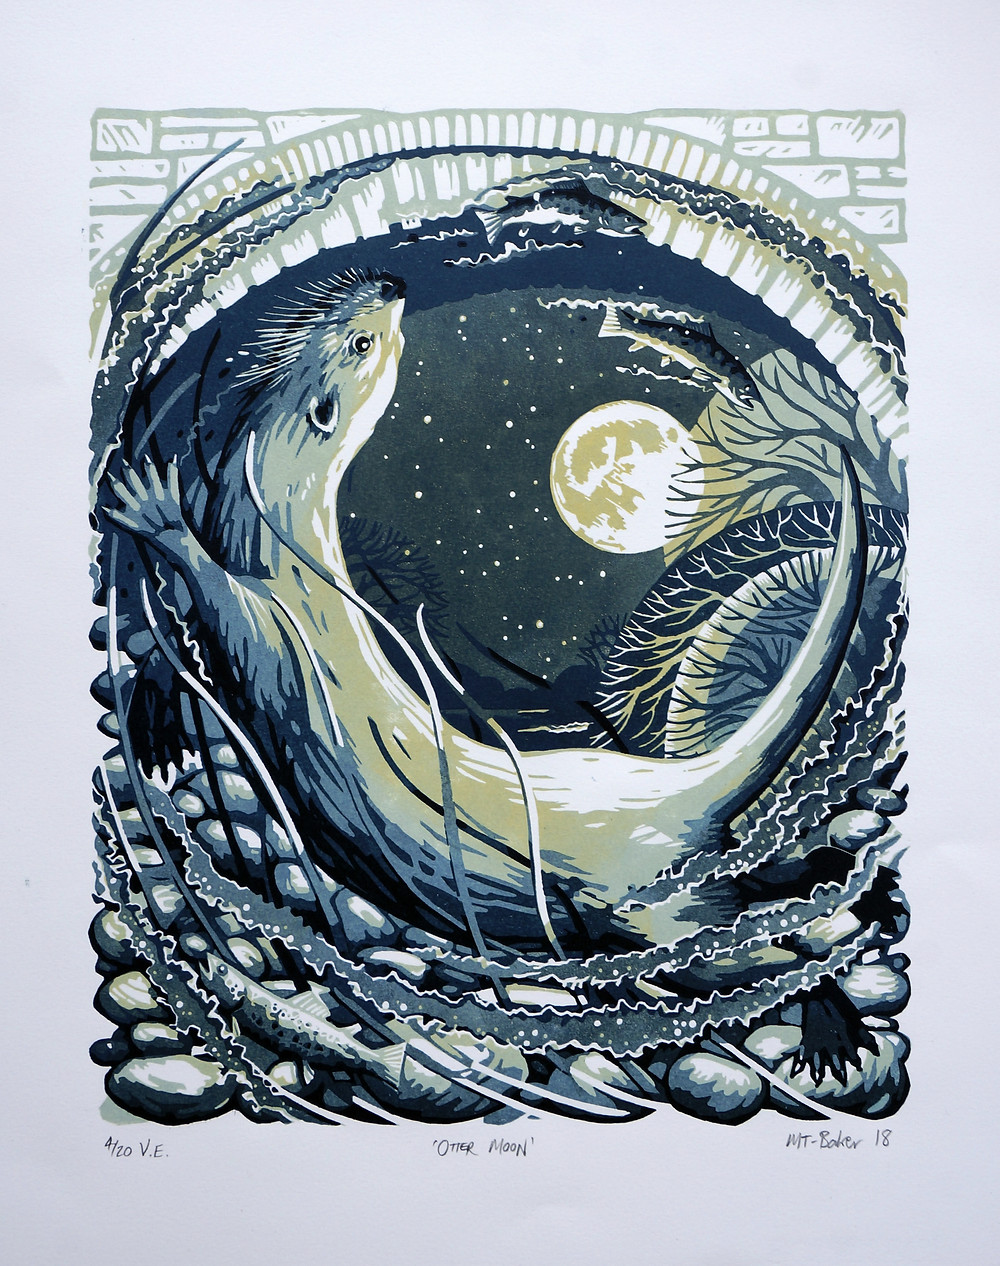 Otter Moon, linocut.